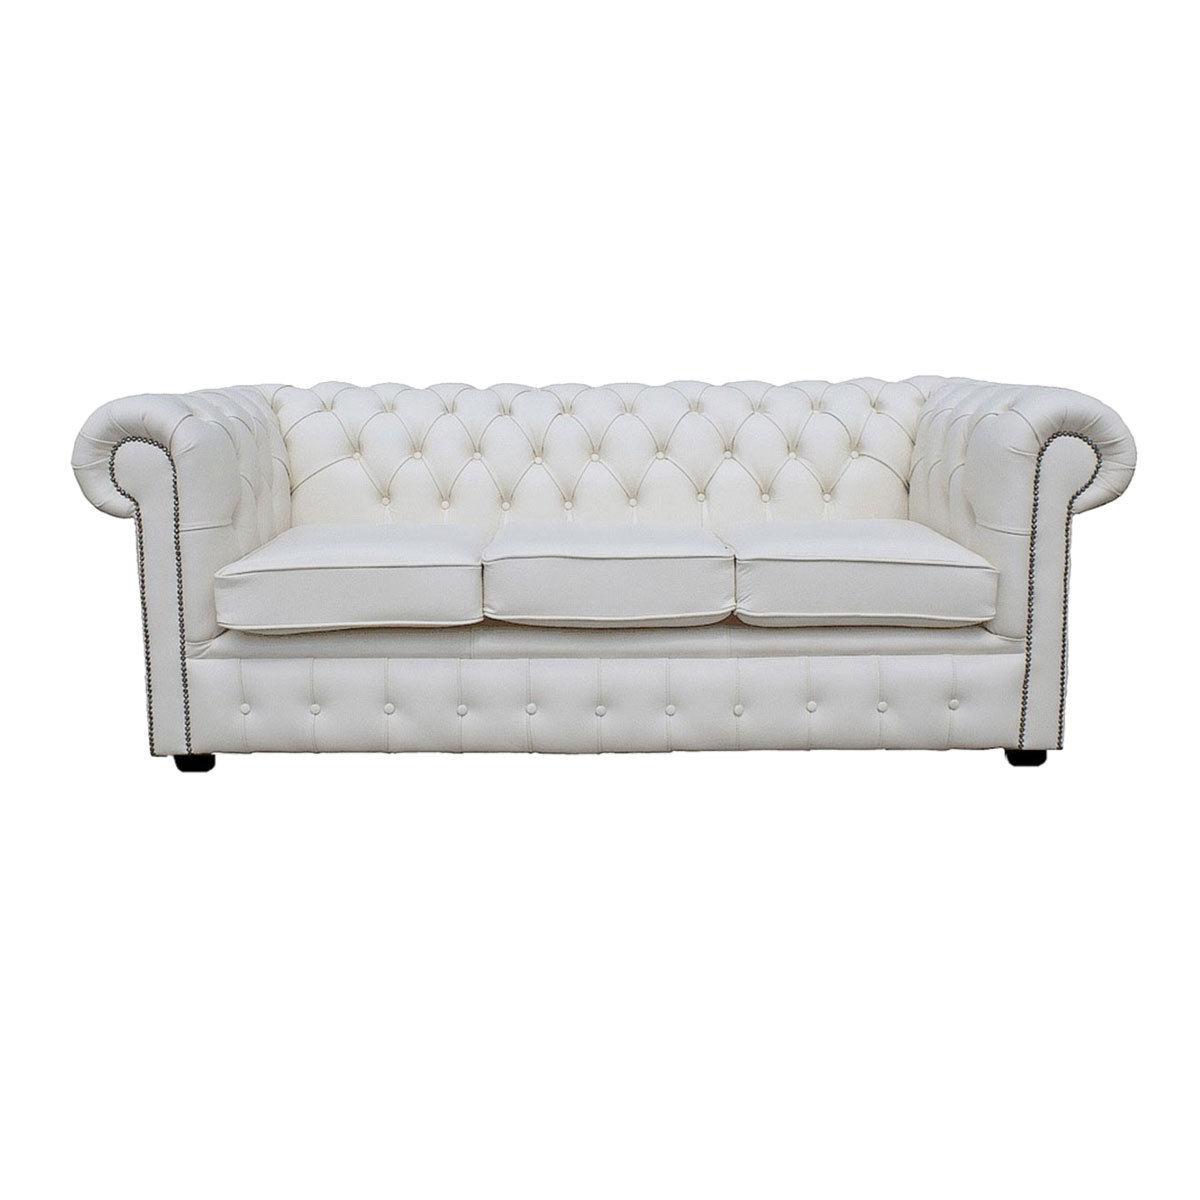 white chesterfield 3 seater sofa antique looking tables 100 vera pelle bianca tre posti divano letto